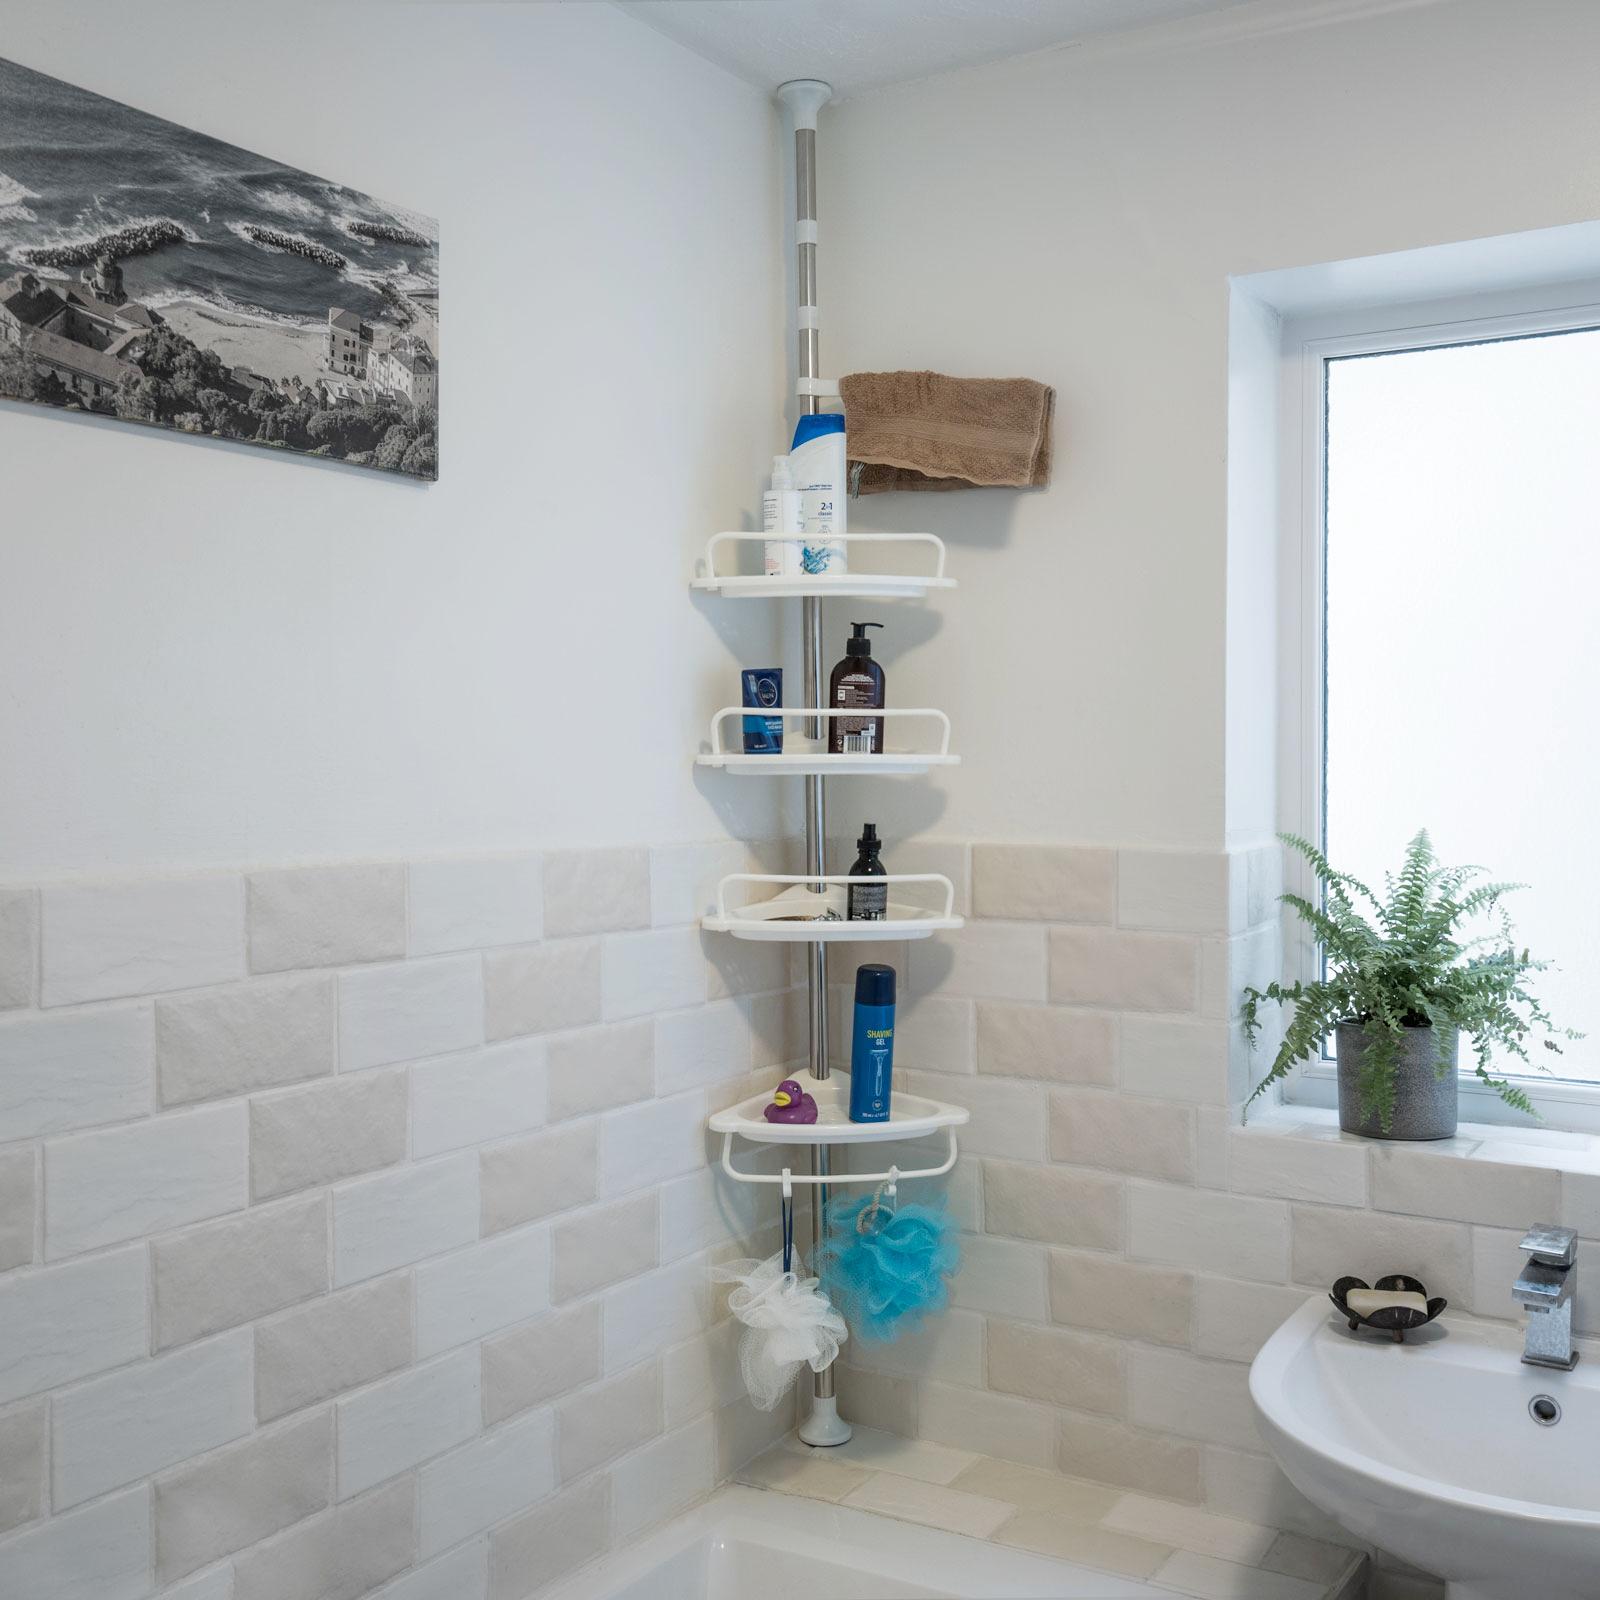 Stainless Steel 4 Tier Bathroom Corner Caddy Telescopic Shower Storage Shelf 5060502538901 Ebay